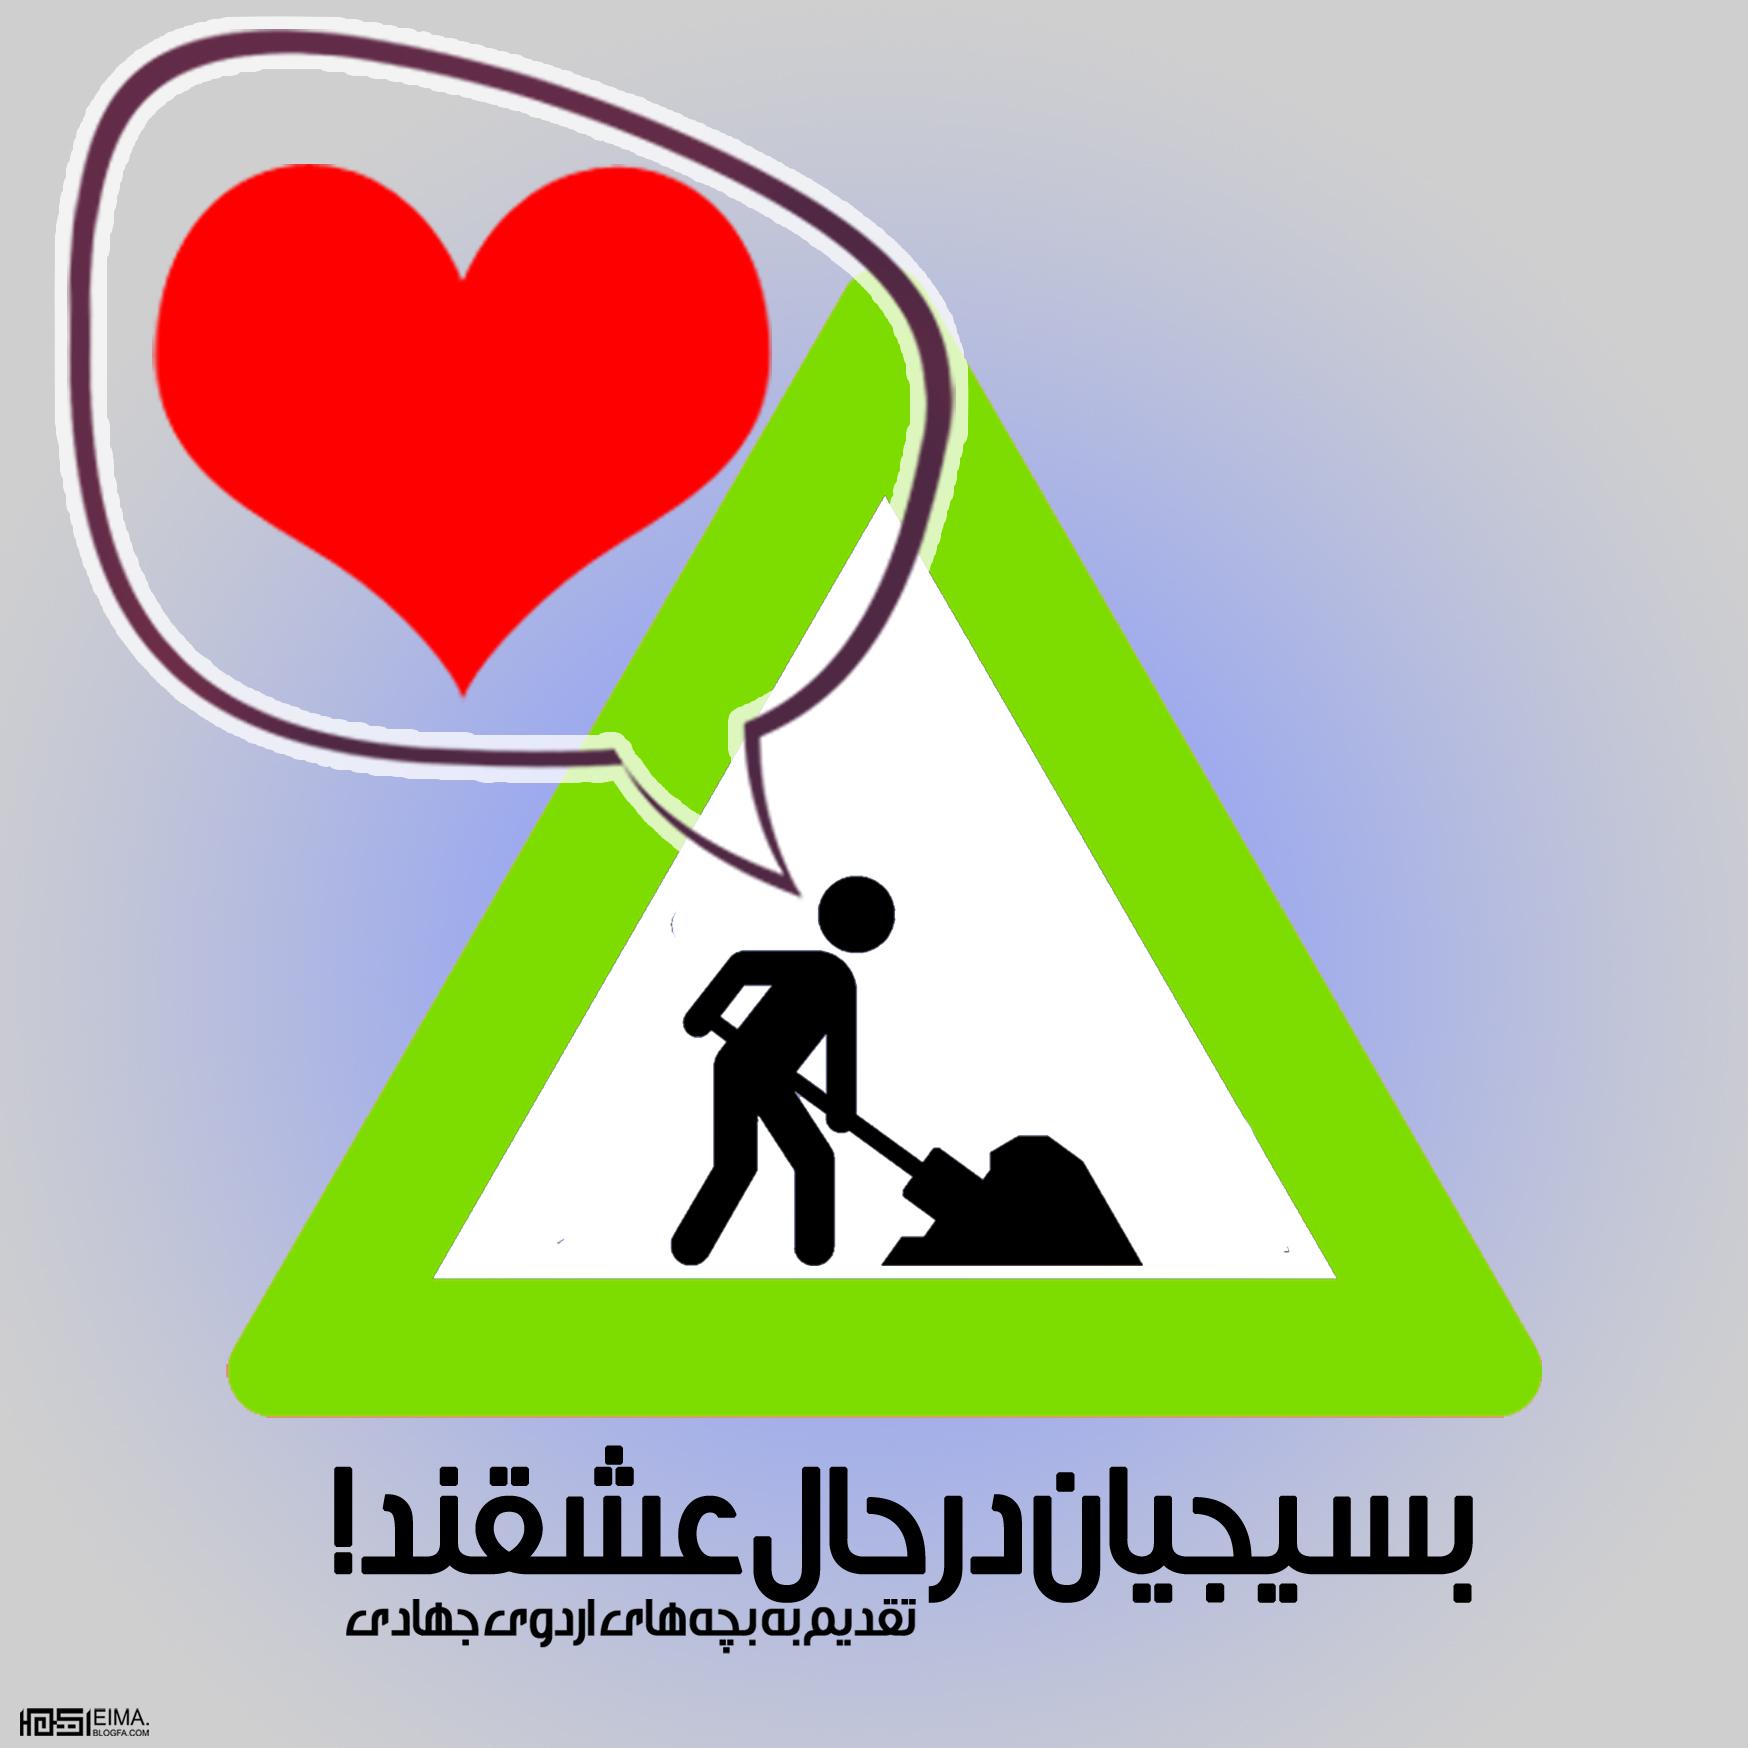 http://eima1.persiangig.com/jahadi.jpg